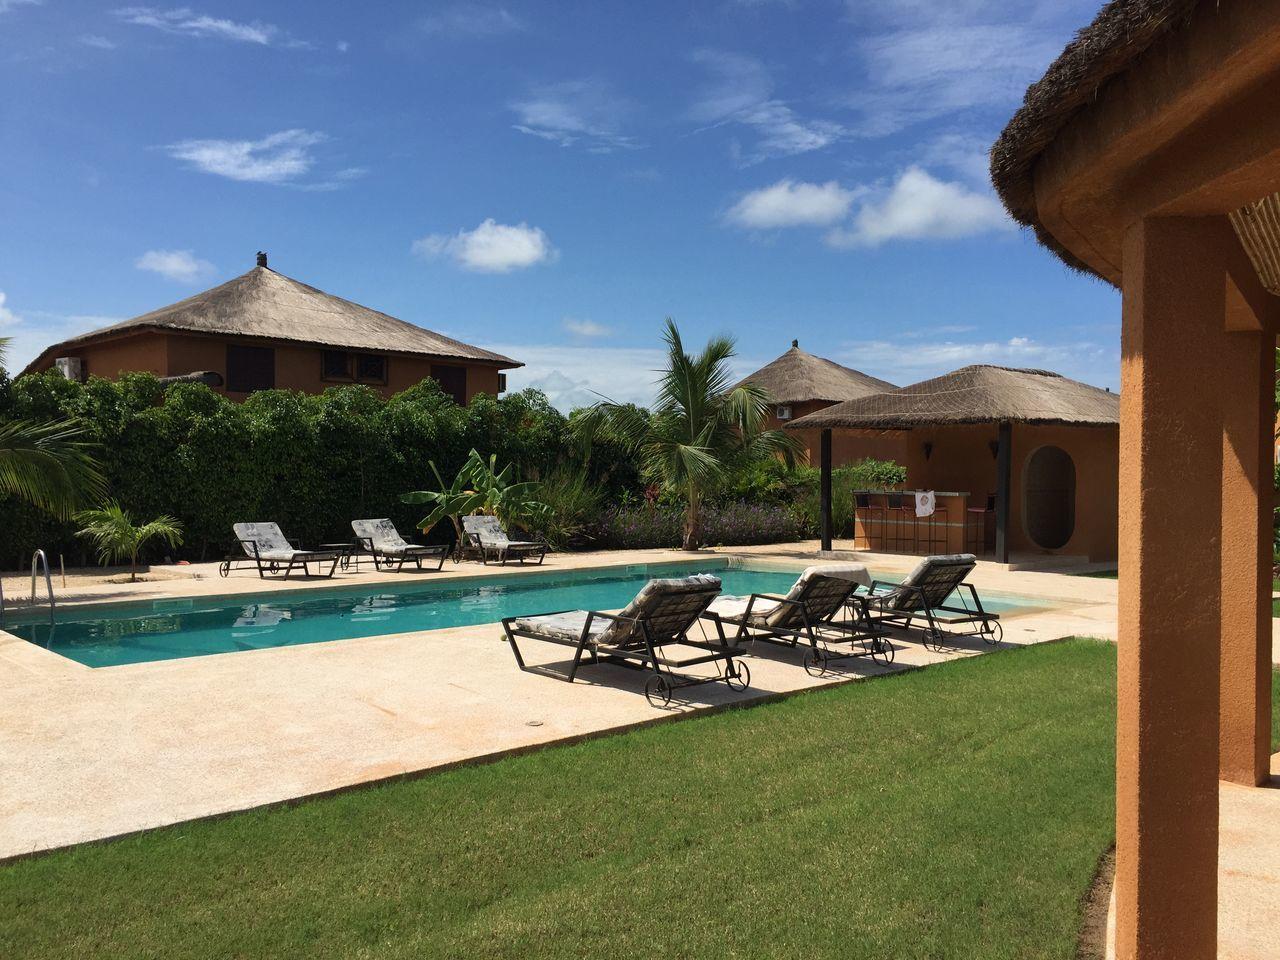 Blue Sky Bluesky Day Grass Green Holiday House House Palm Palm Trees Pool Tree